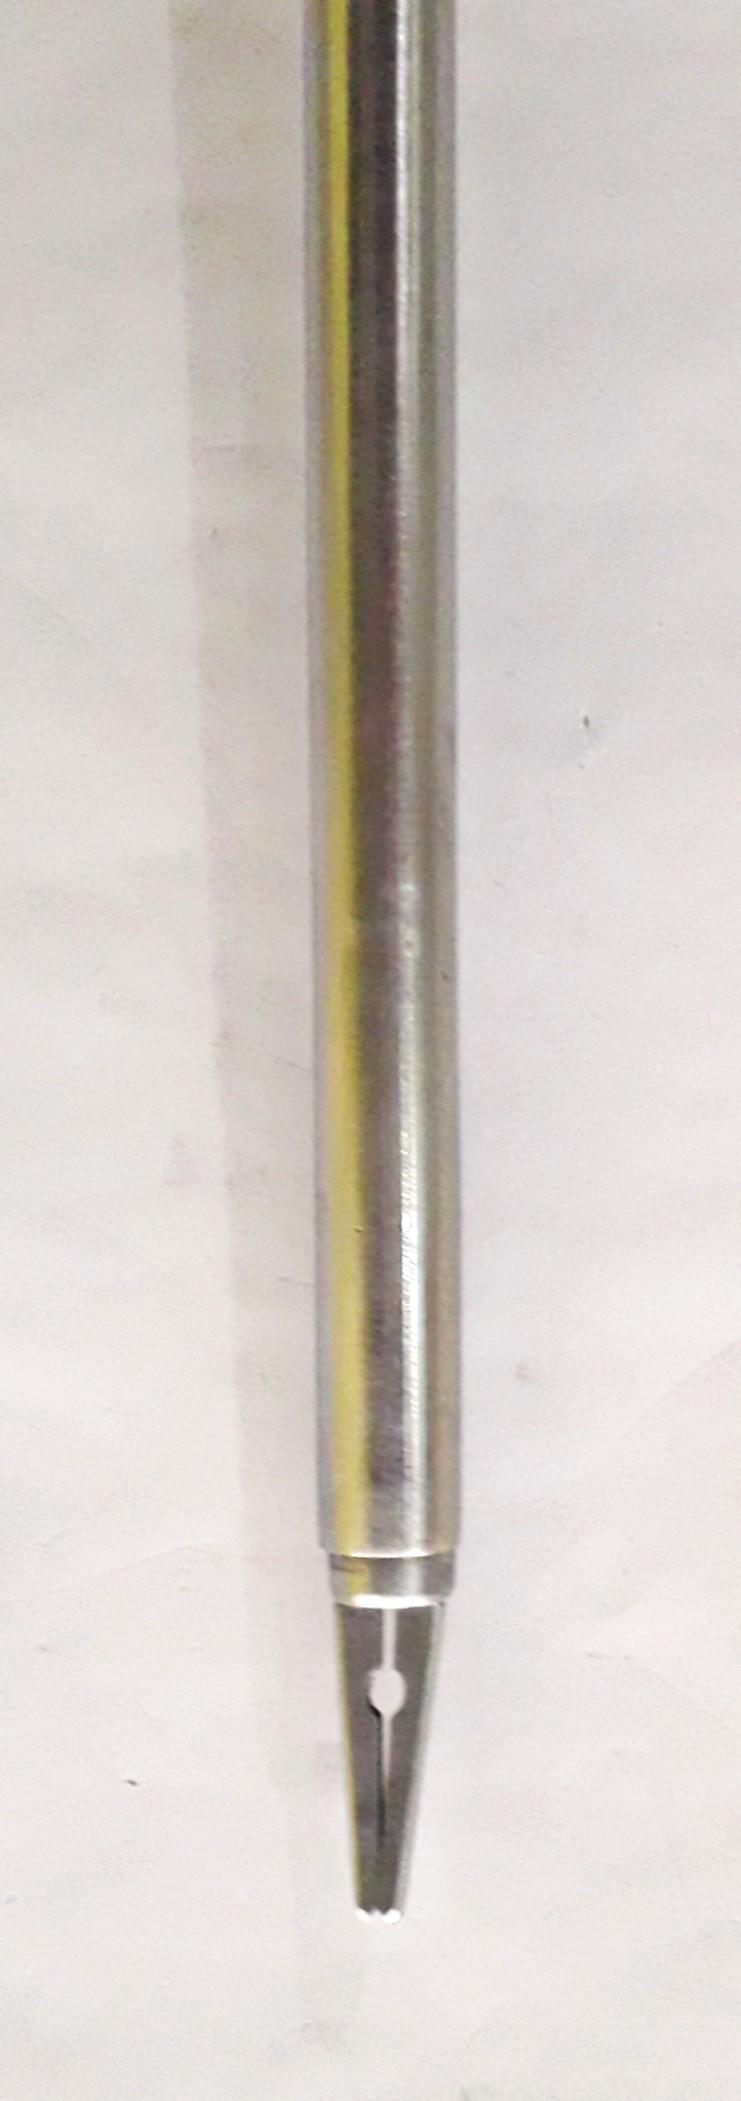 Laparoscopic Clip Applicator Set 10mm